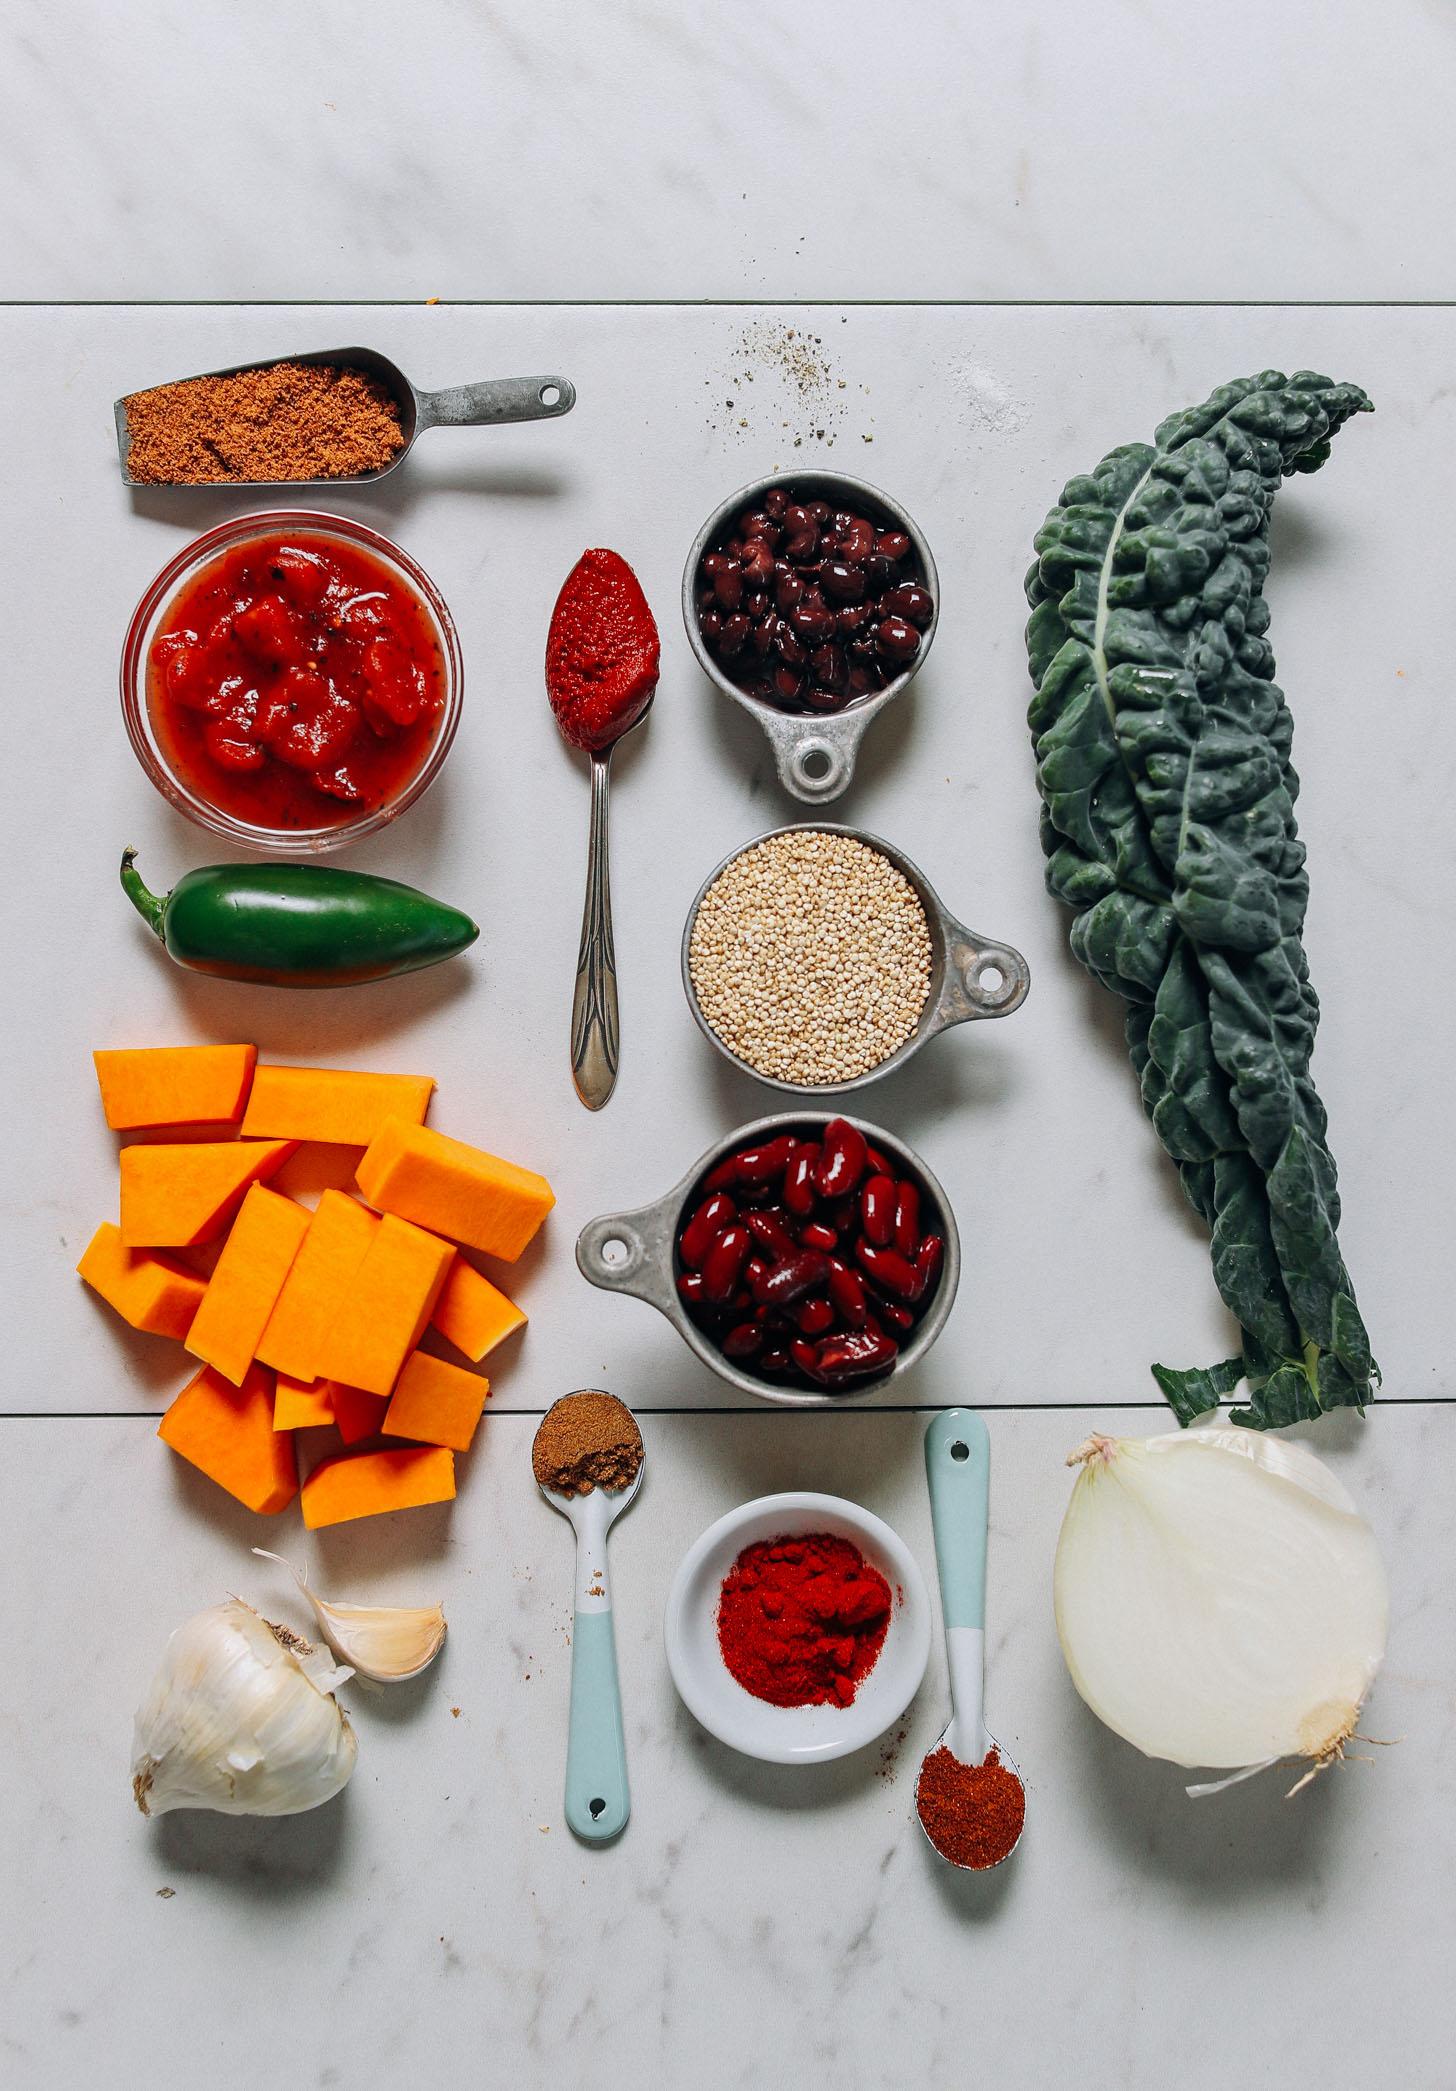 Ingredients for making our 1 pot gluten-free vegan Butternut Squash Quinoa Chili